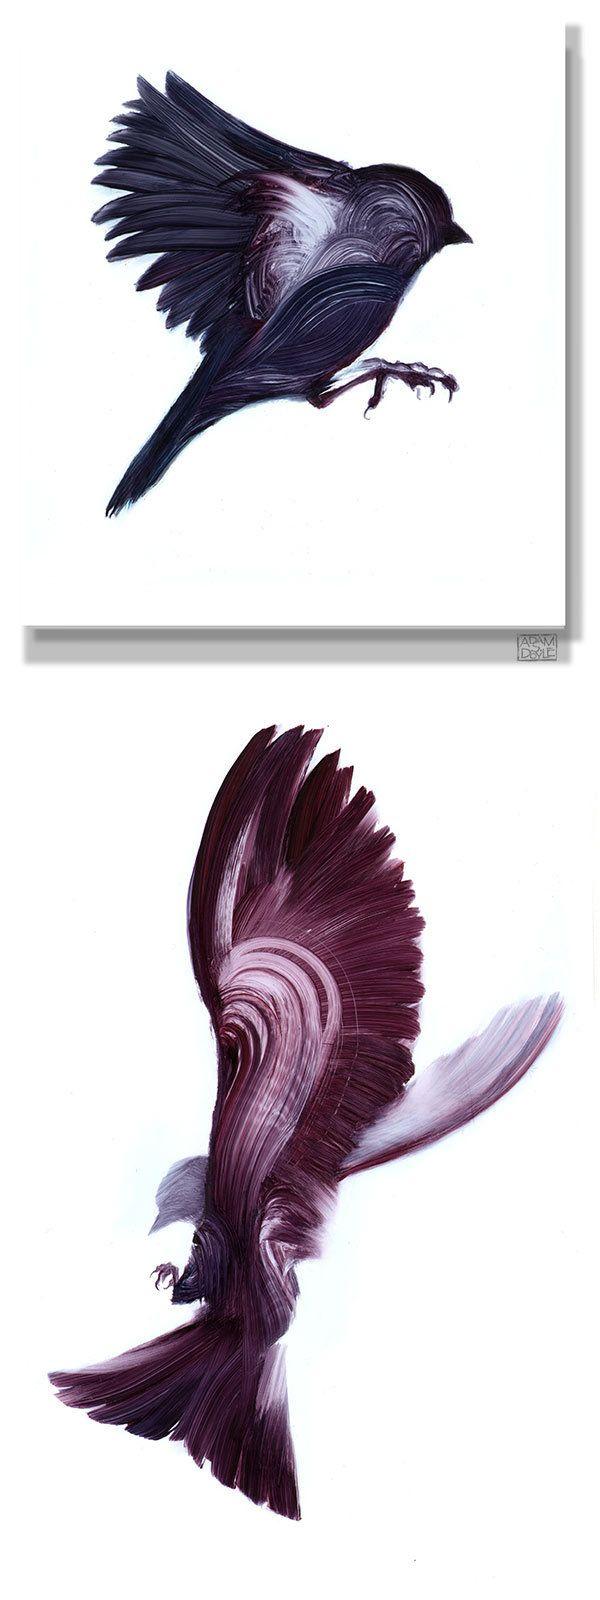 Photo of 50 graphic and original illustrations around the bird